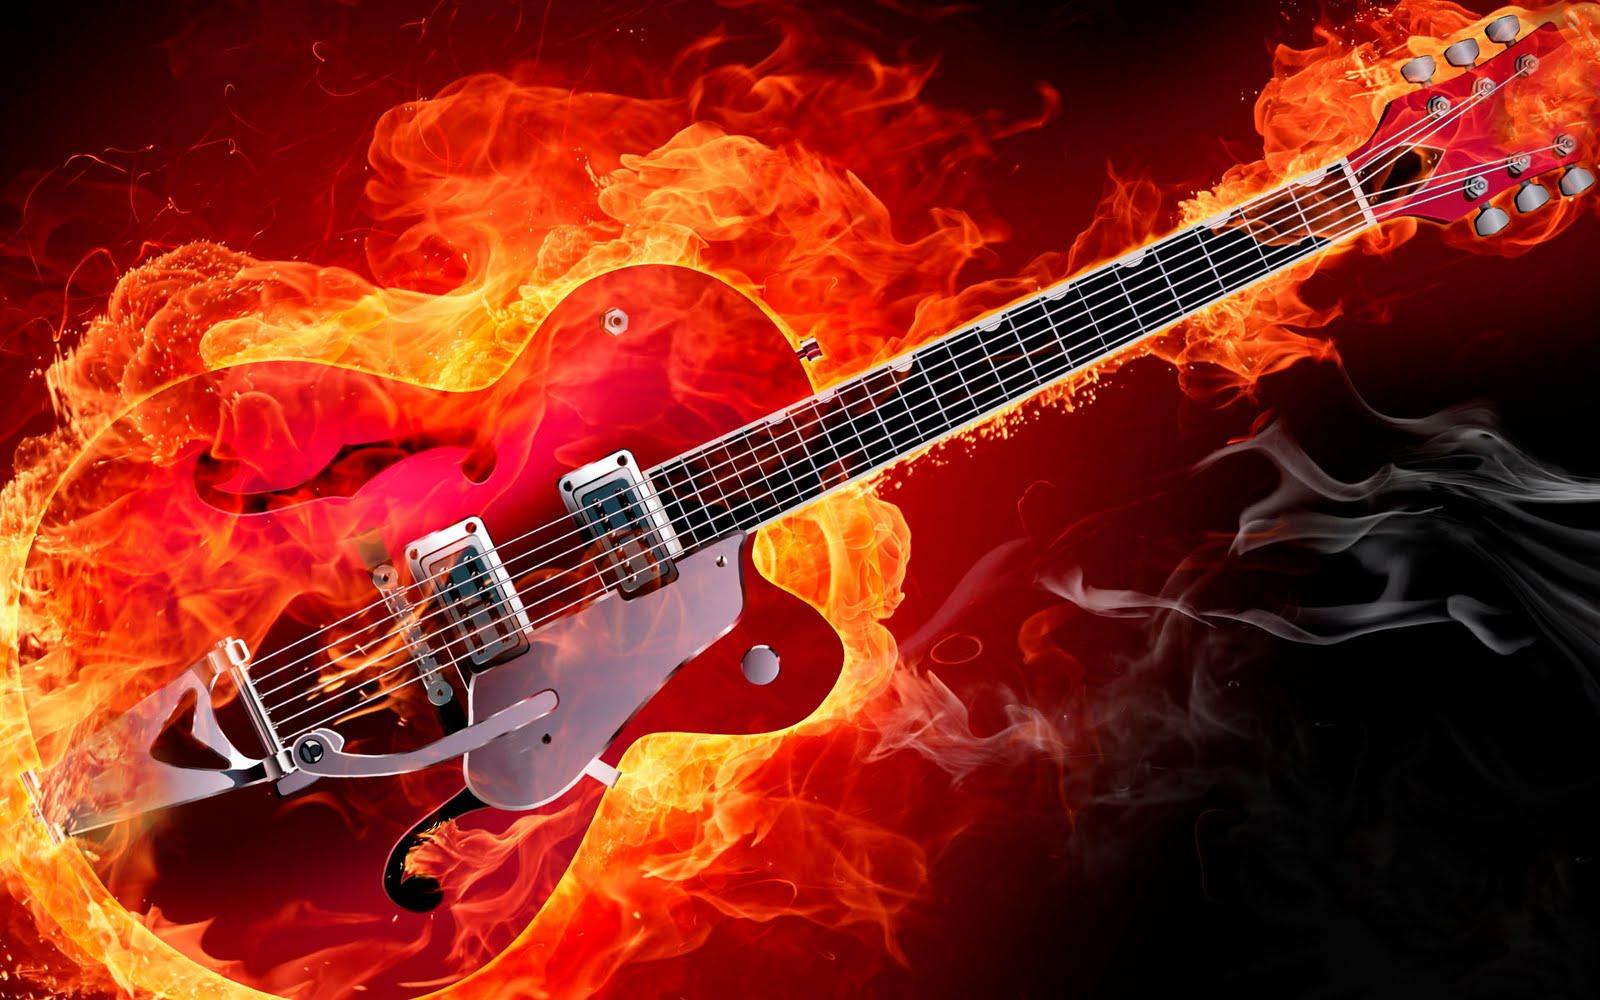 Electric Guitar Wallpaper For Desktop Hd Background   HD Wallpapers 1600x1000